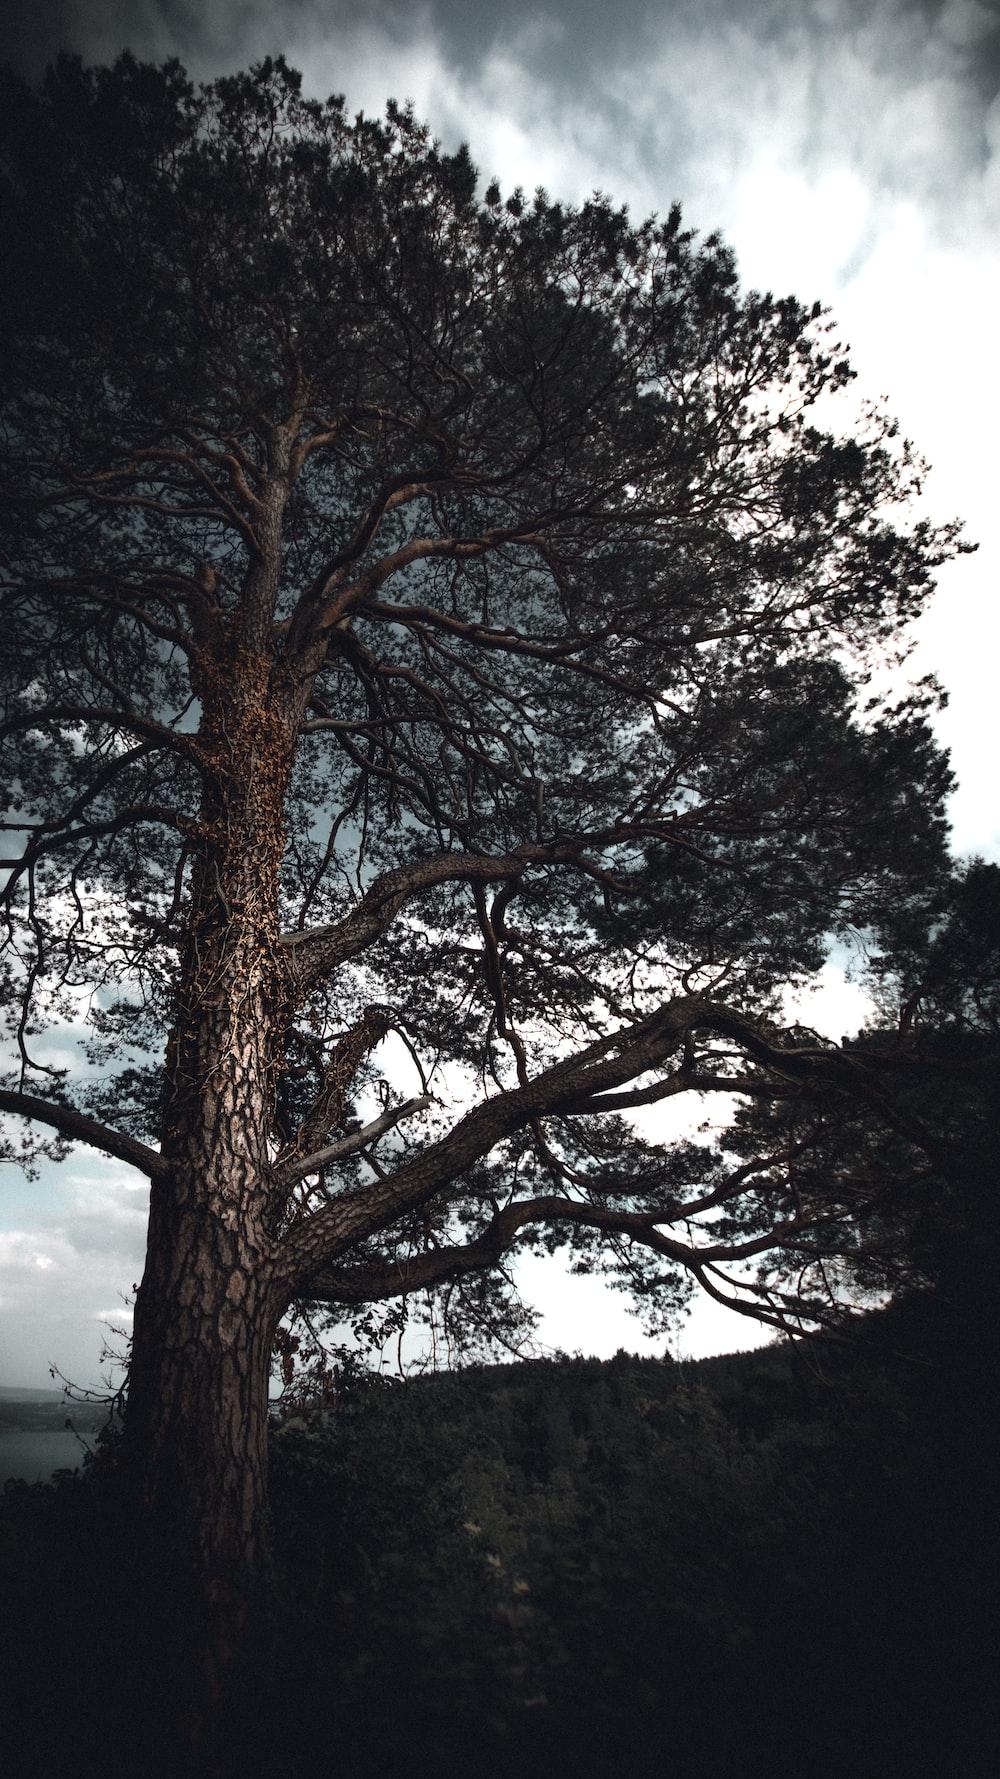 brown tree under white sky during daytime